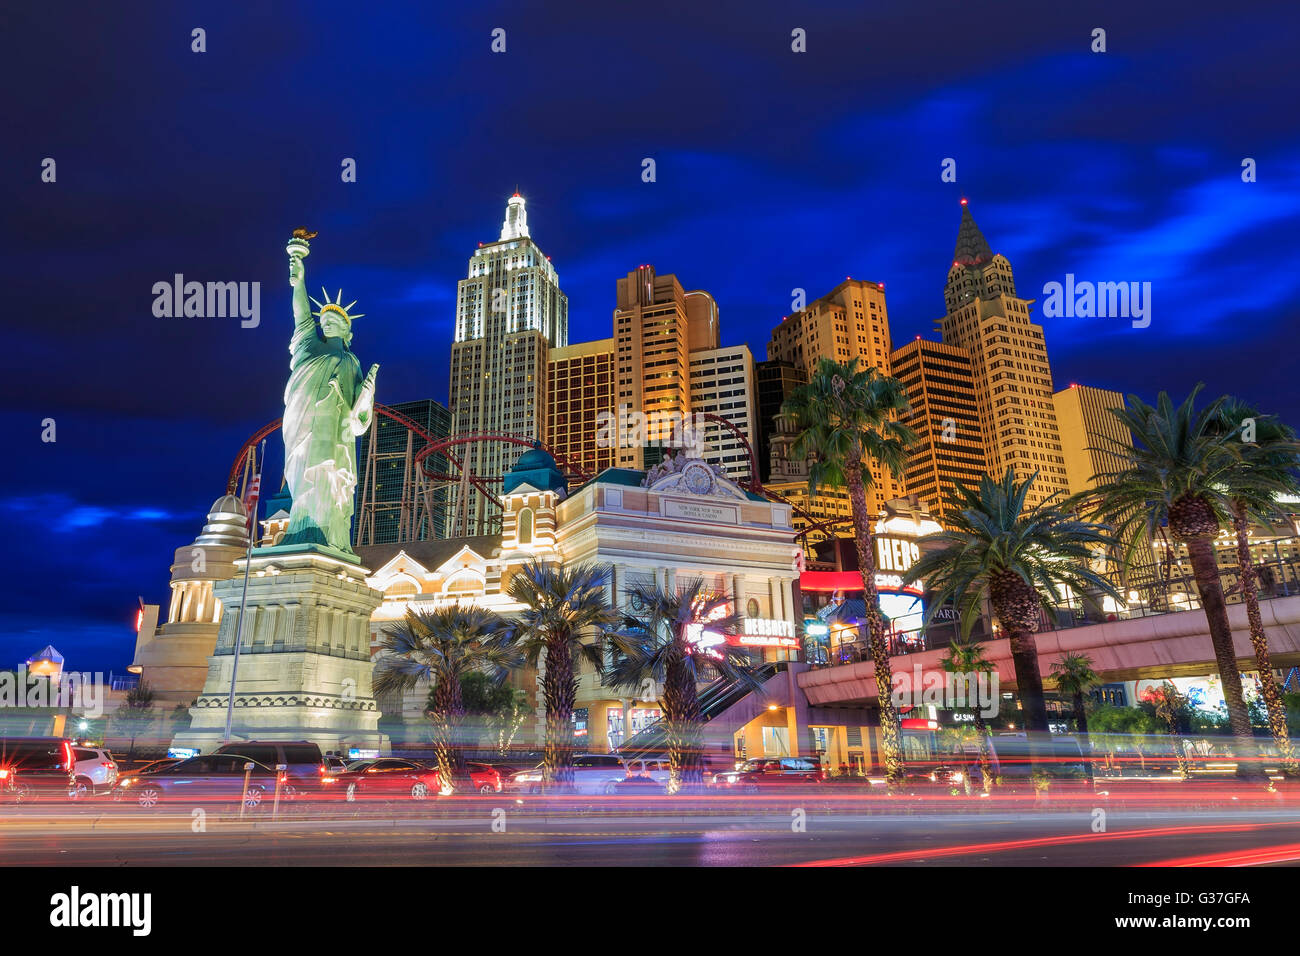 AUG 5, Las Vegas: The famous New York New York Hotel & Casino on AUG 5, 2015 at Las Vegas, Nevada - Stock Image